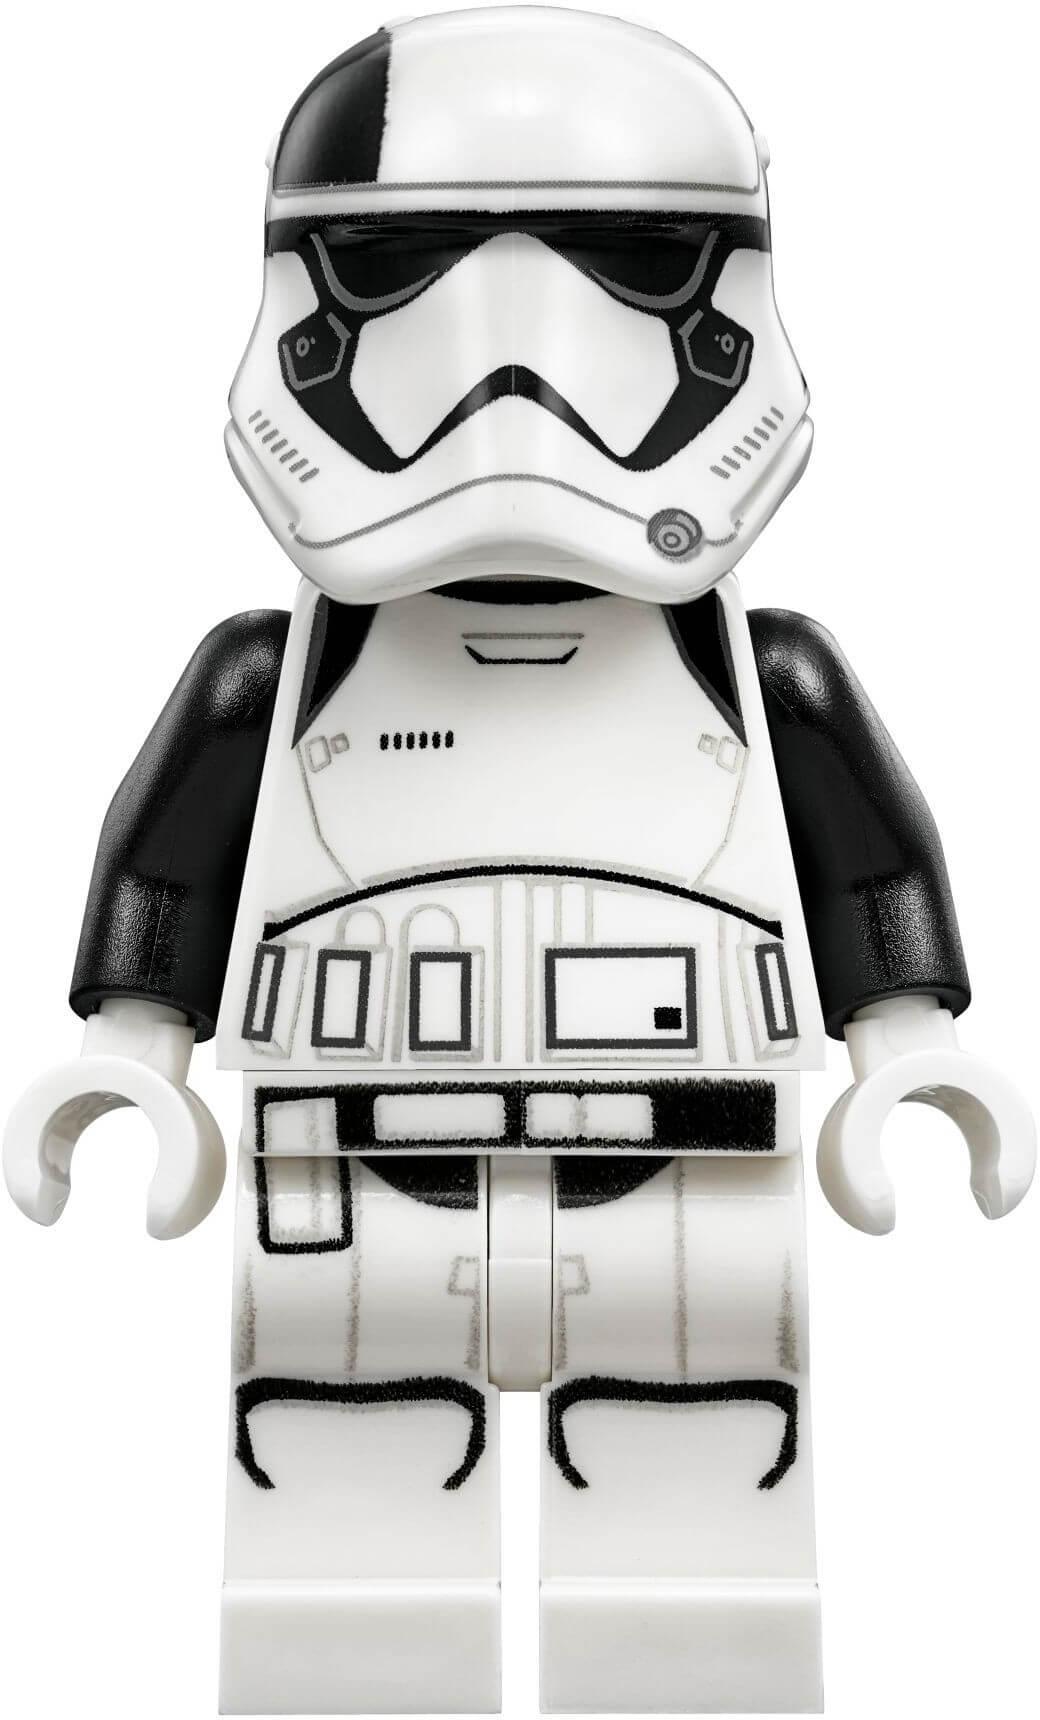 Mua đồ chơi LEGO 75197 - LEGO Star Wars 75197 - Đội Đặc Nhiệm First Order (LEGO Star Wars 75197 First Order Specialists Battle Pack)